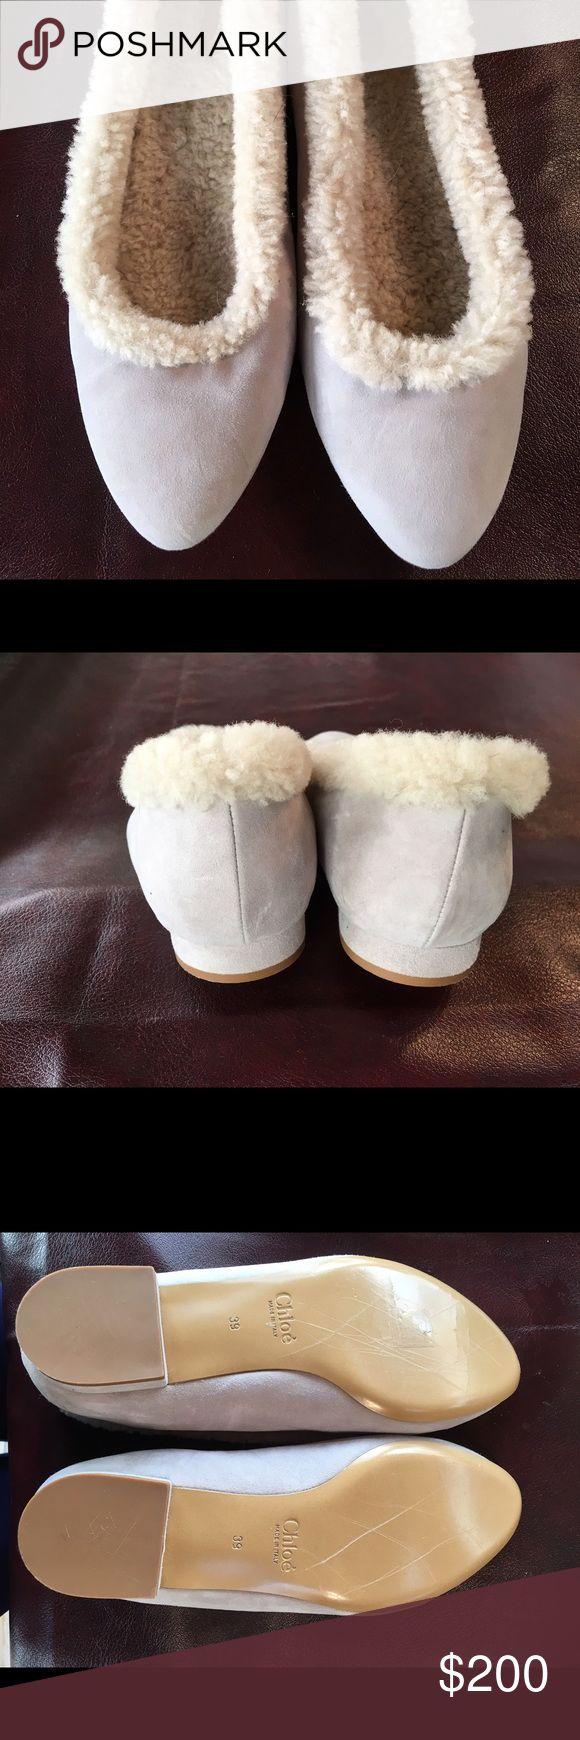 Chloe brand new slippers Gorgeous never worn size 39 Chloe slippers with faux fur. Chloe Shoes Slippers